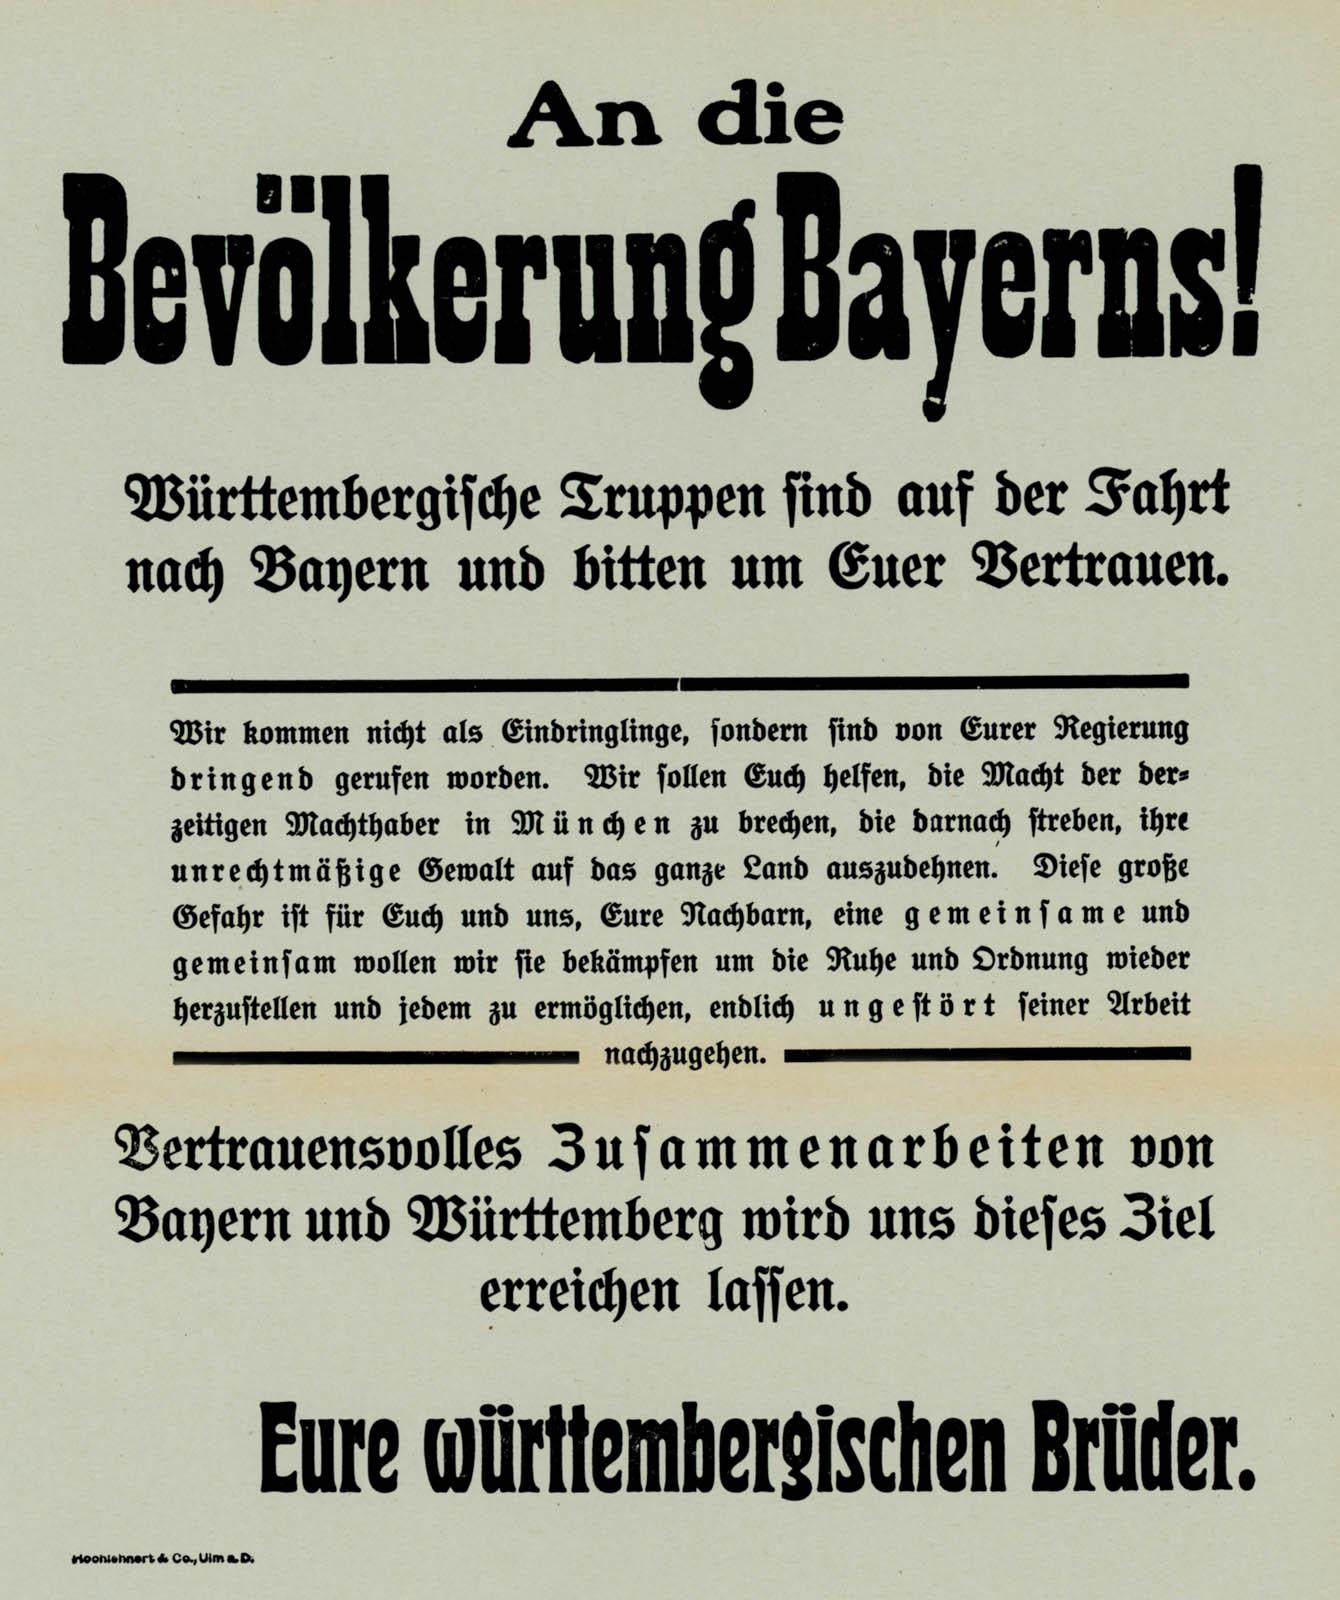 An die Bevölkerung Bayerns